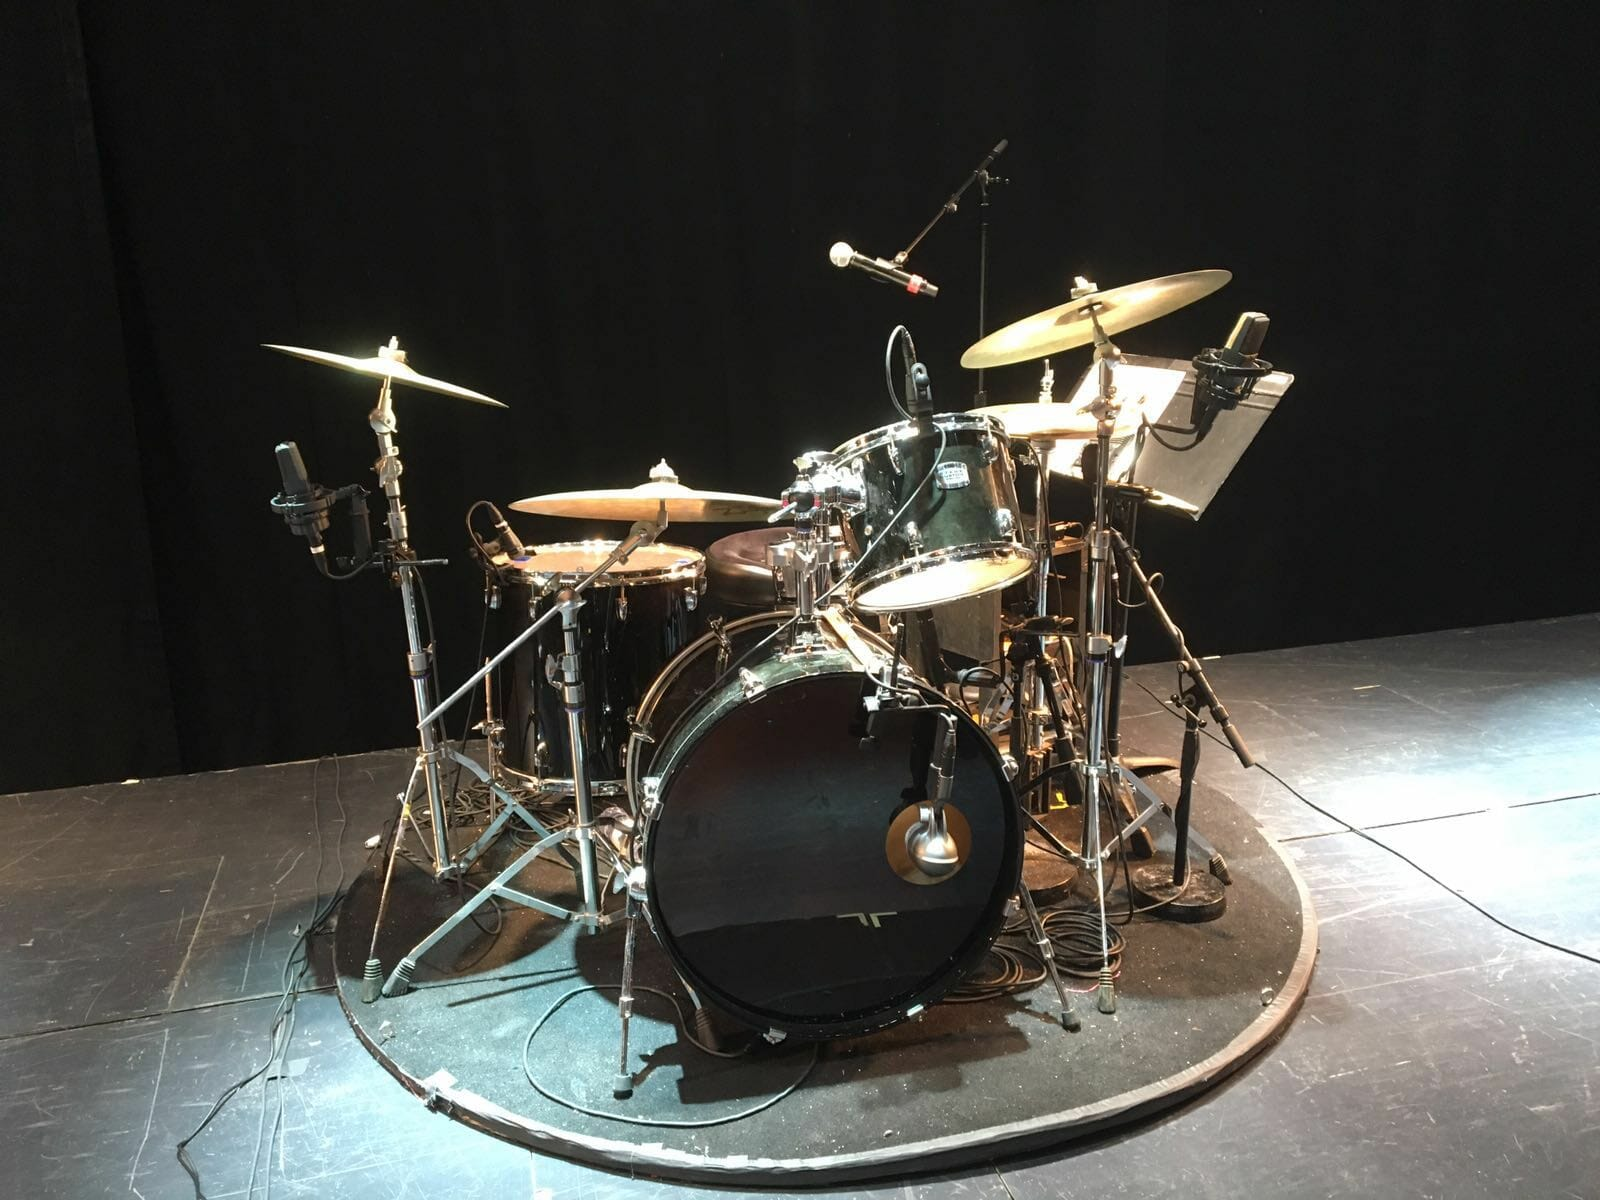 Drum Kit, Theatre, Sixties theatre show, sixties show, 1960s show, The Zoots sixties show, 60s band,